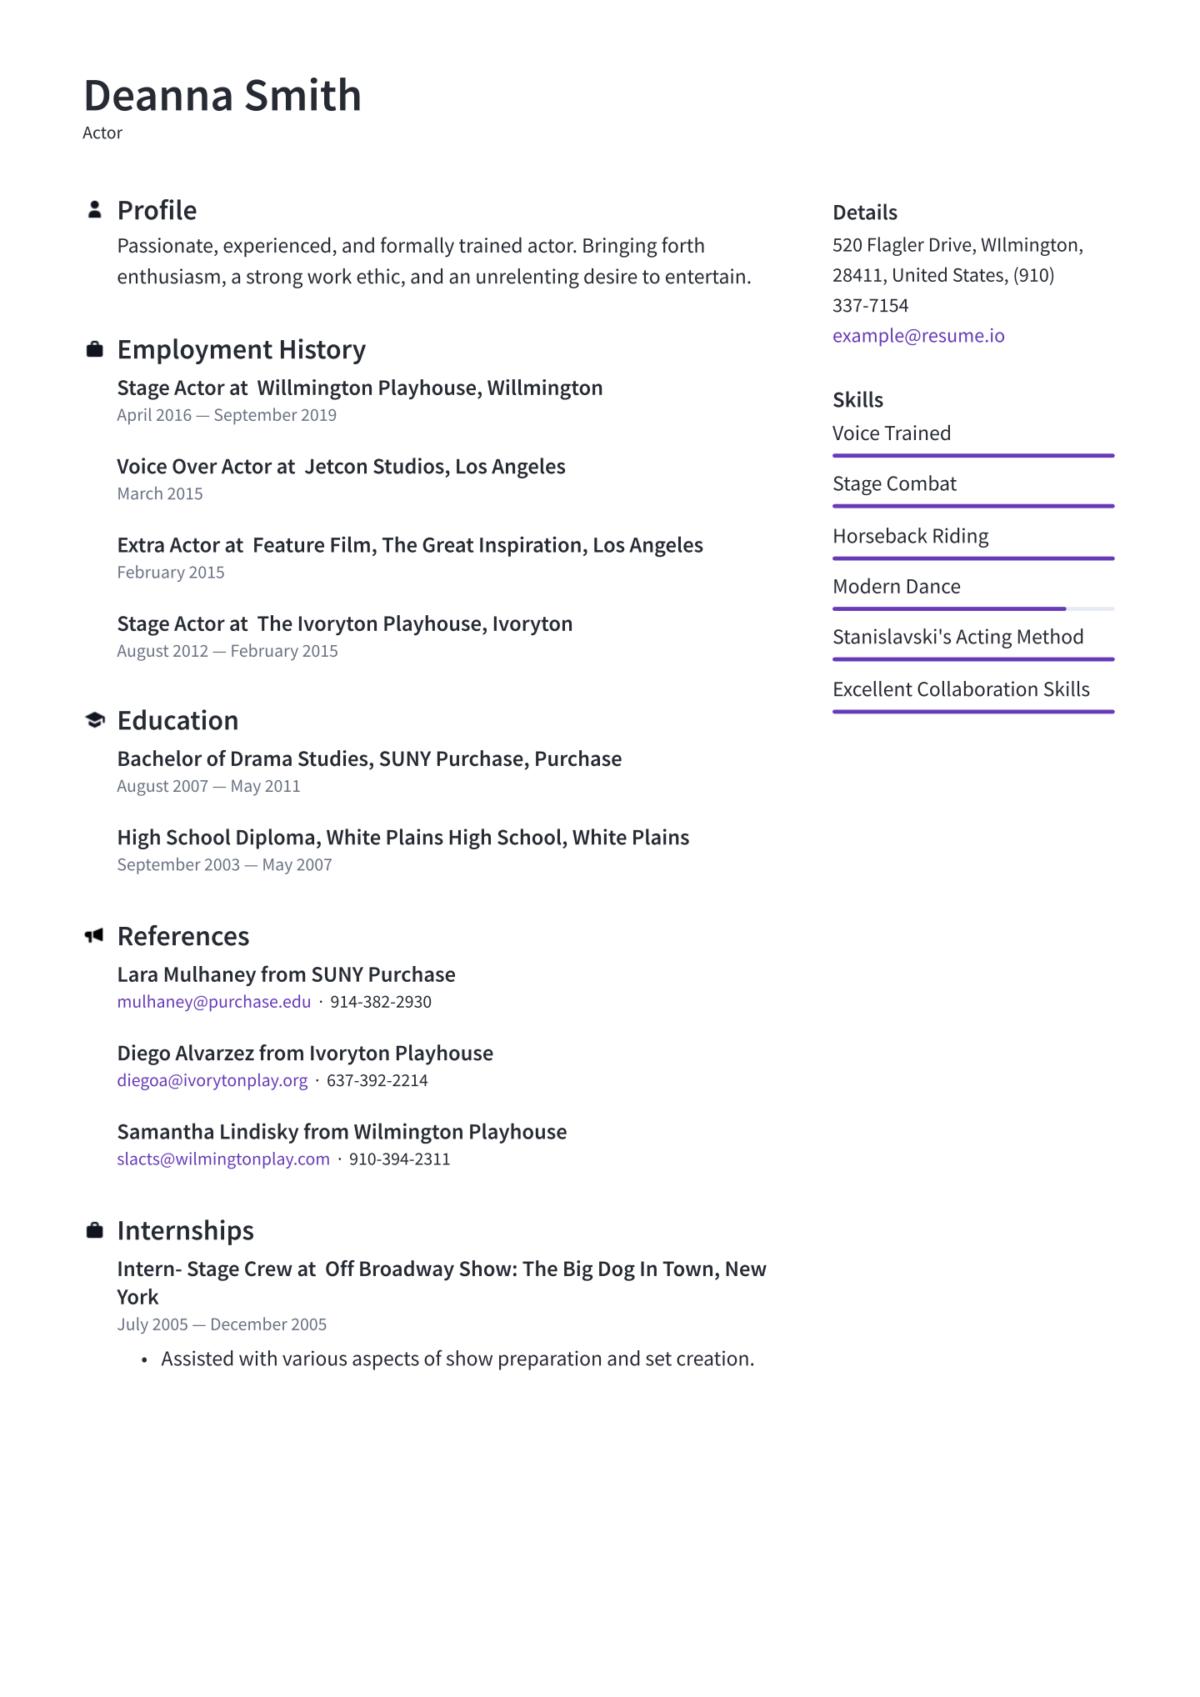 Actor Resume Templates 2020 (Free Download) · Resume.io